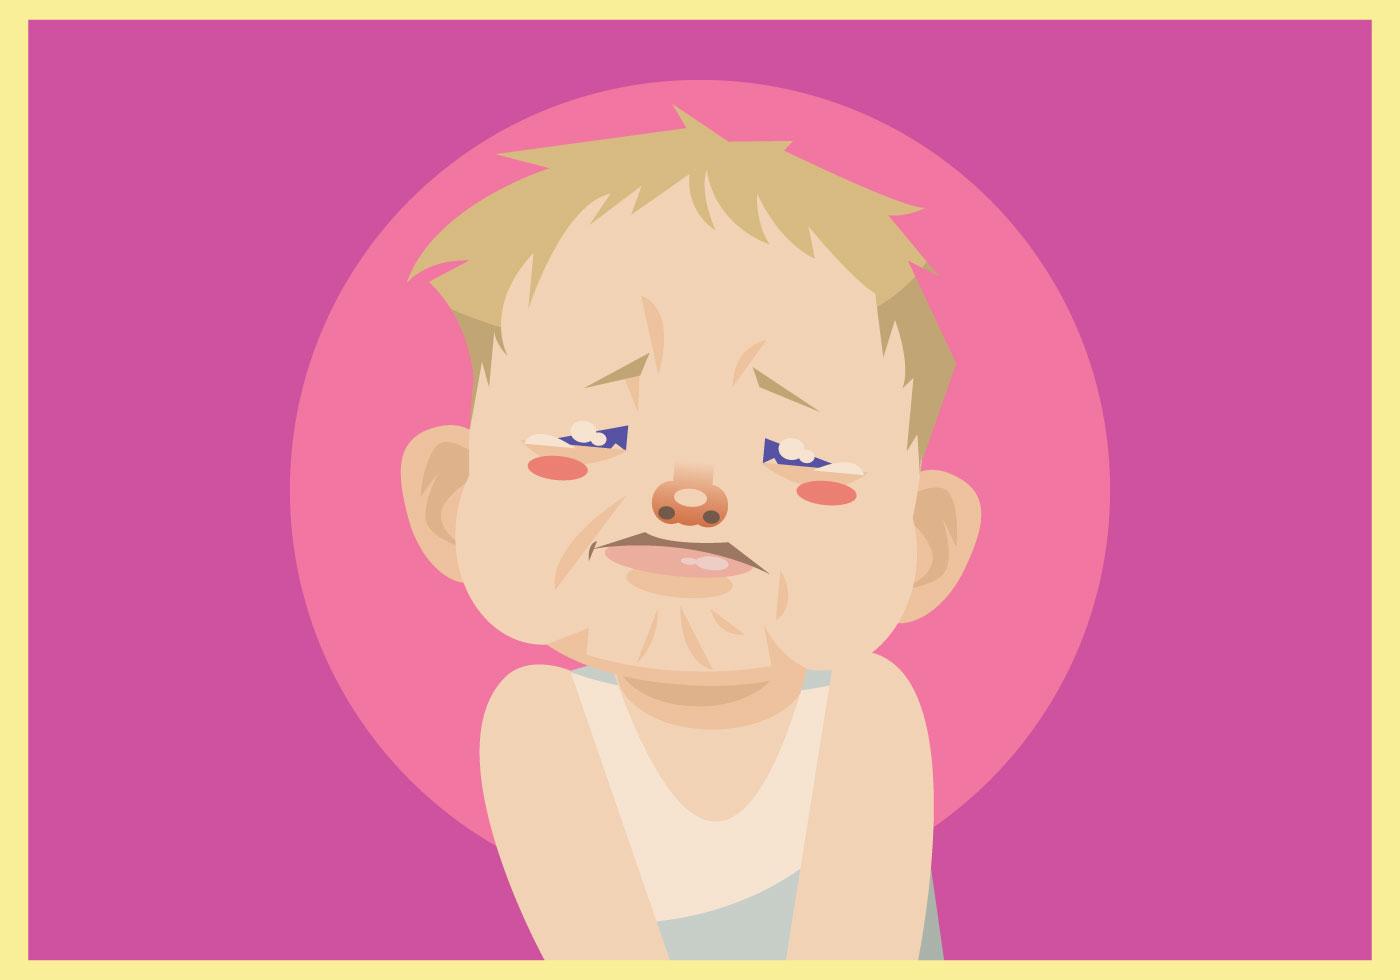 Little Cute Baby Girl Wallpaper Crying Baby Boy Vector Download Free Vector Art Stock